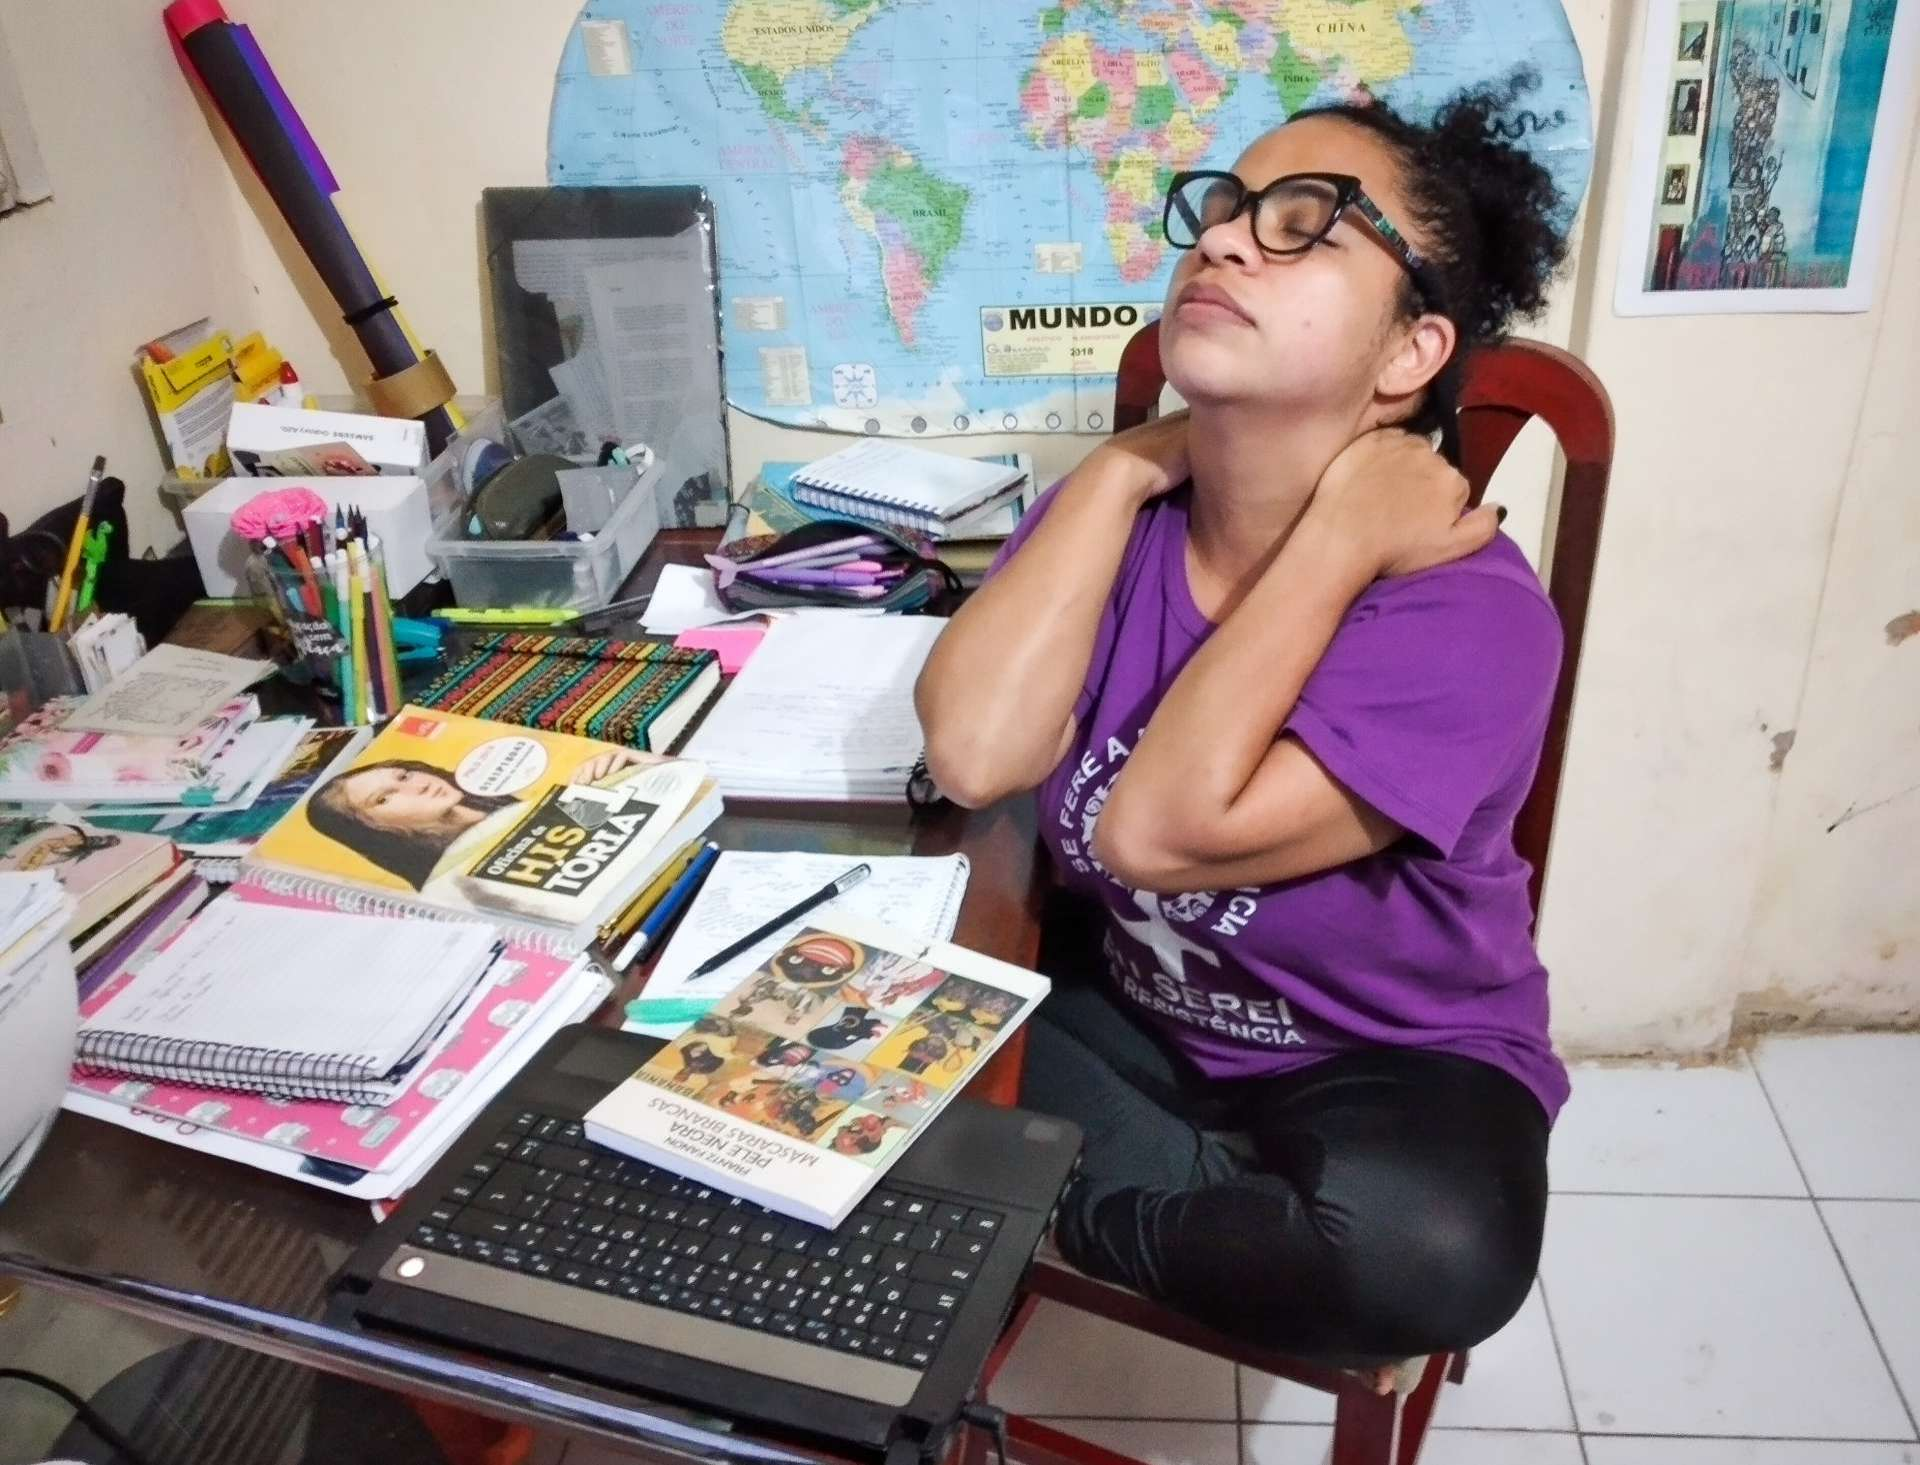 CÍCERA Barbosa, 35, professora da rede estadual: sobrecarga física e emocional durante a pandemia